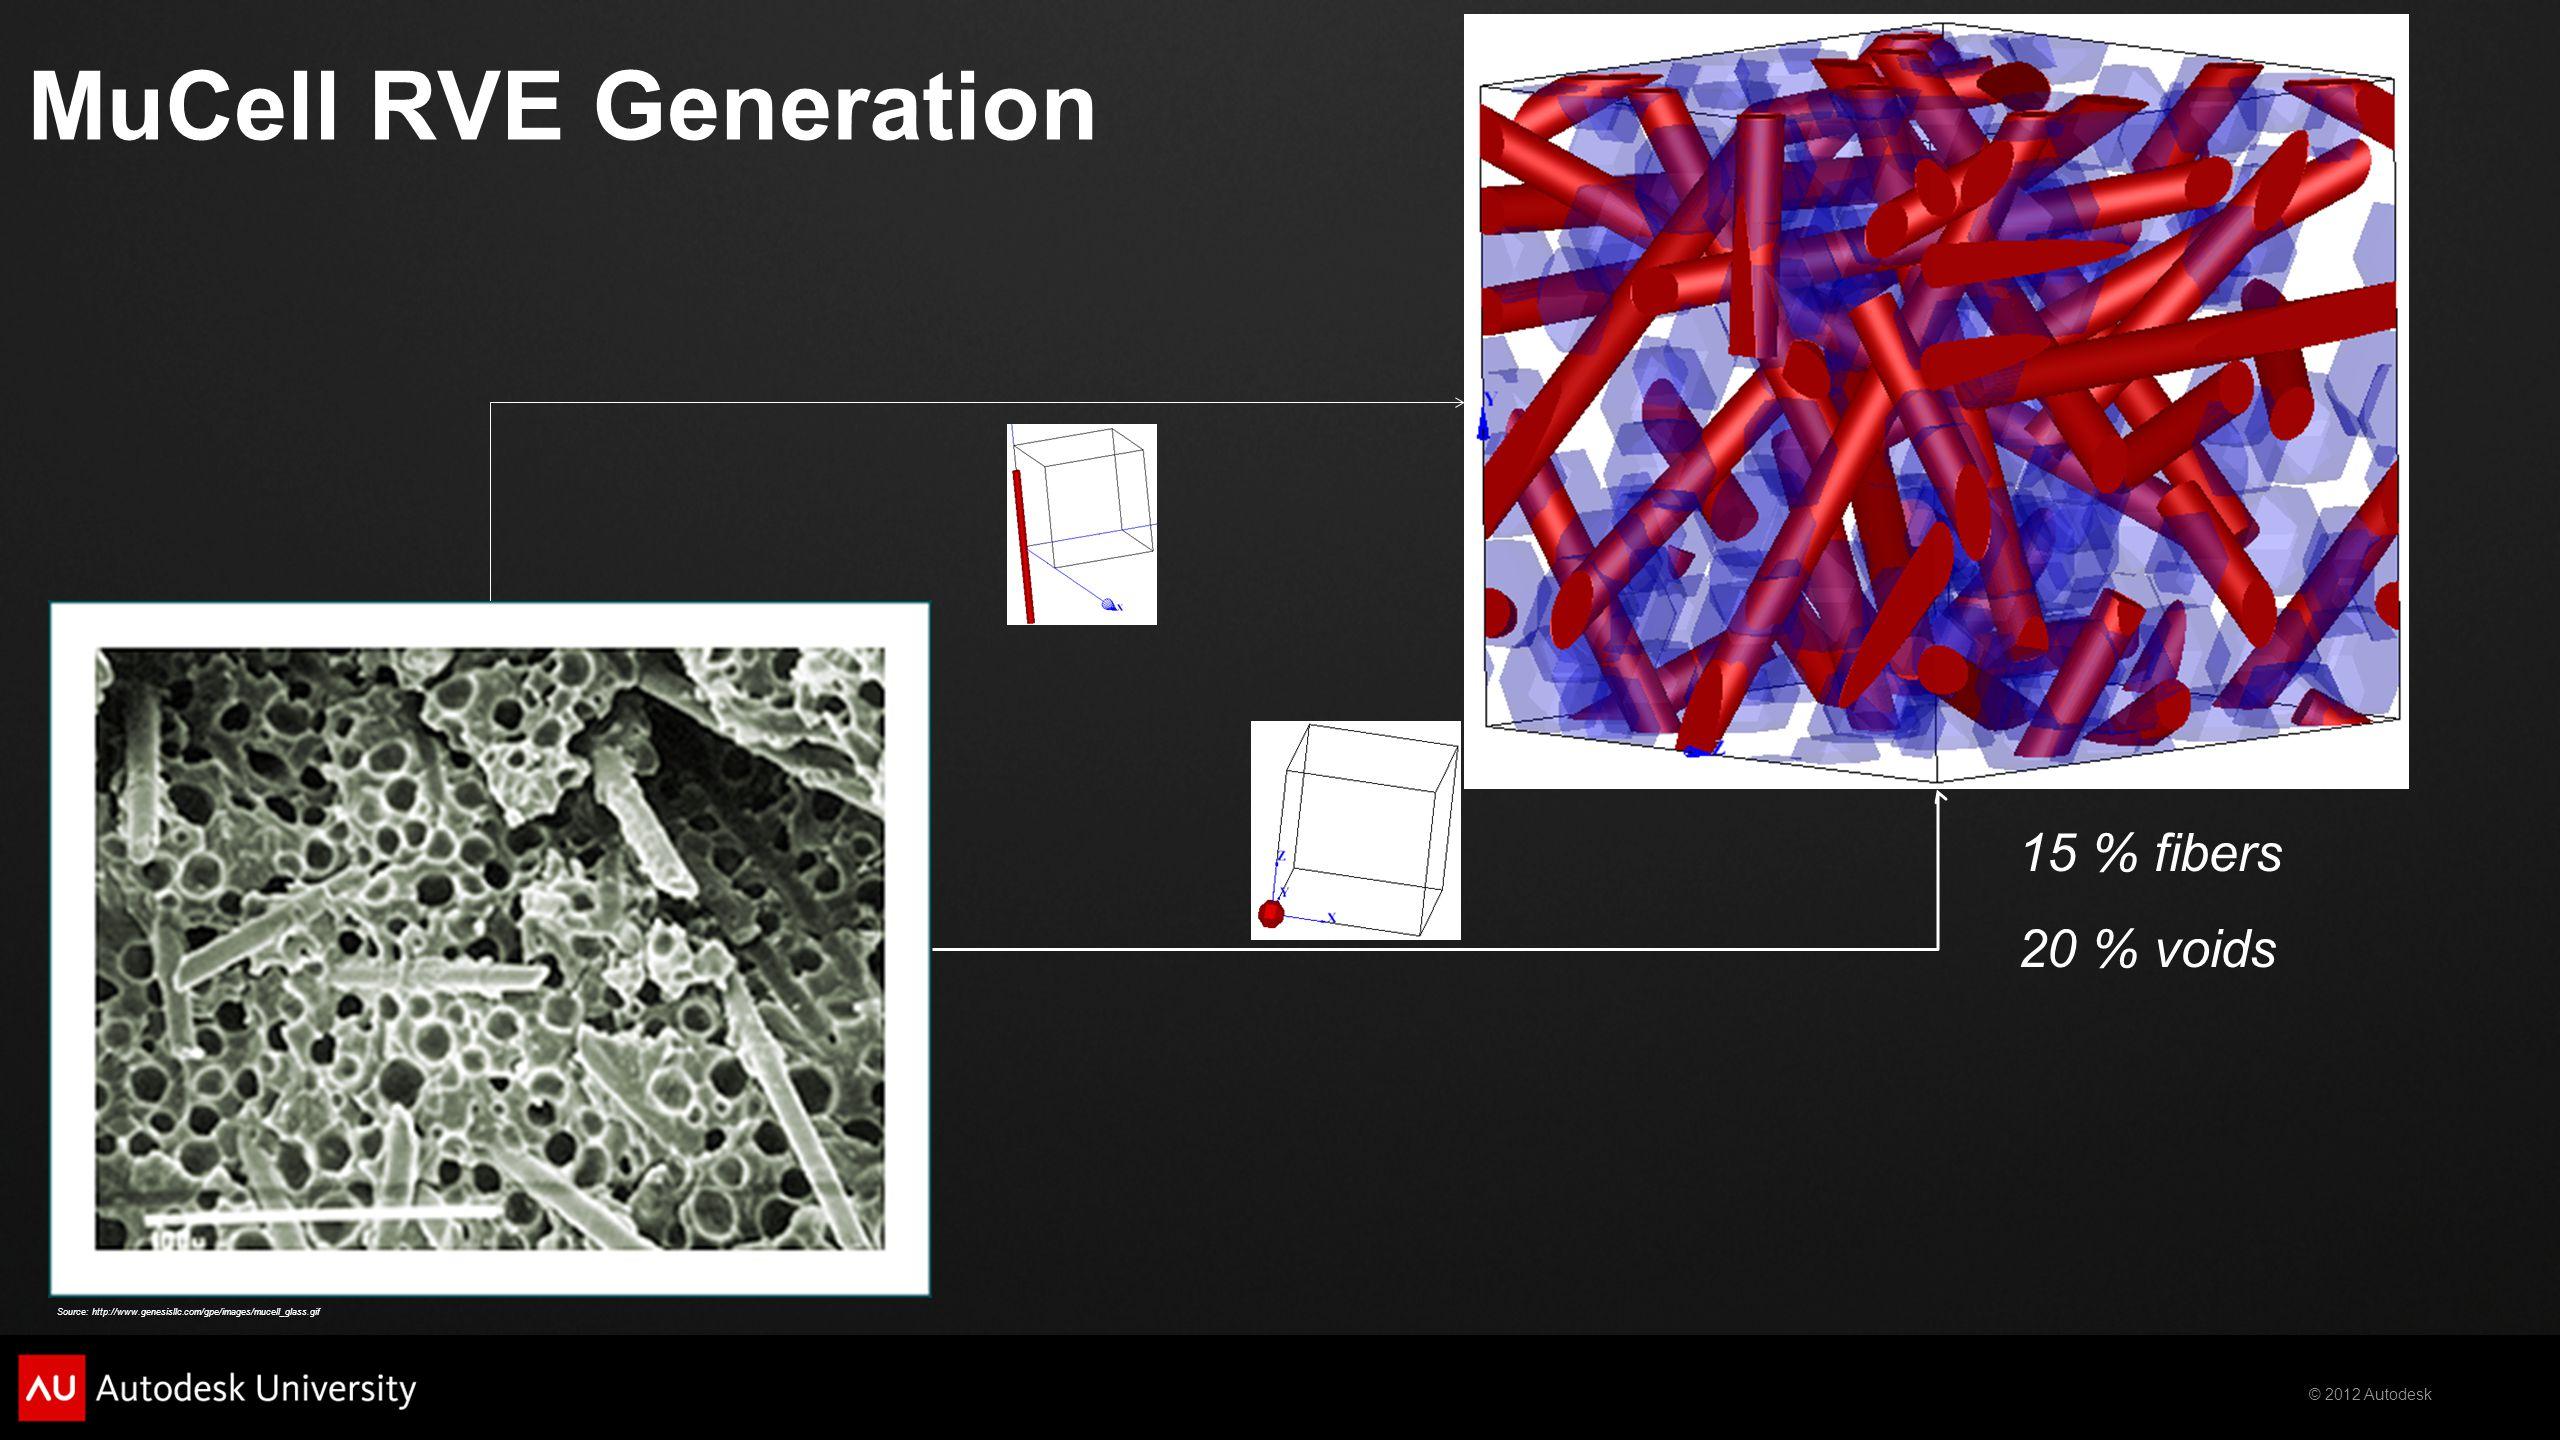 MuCell RVE Generation 15 % fibers 20 % voids